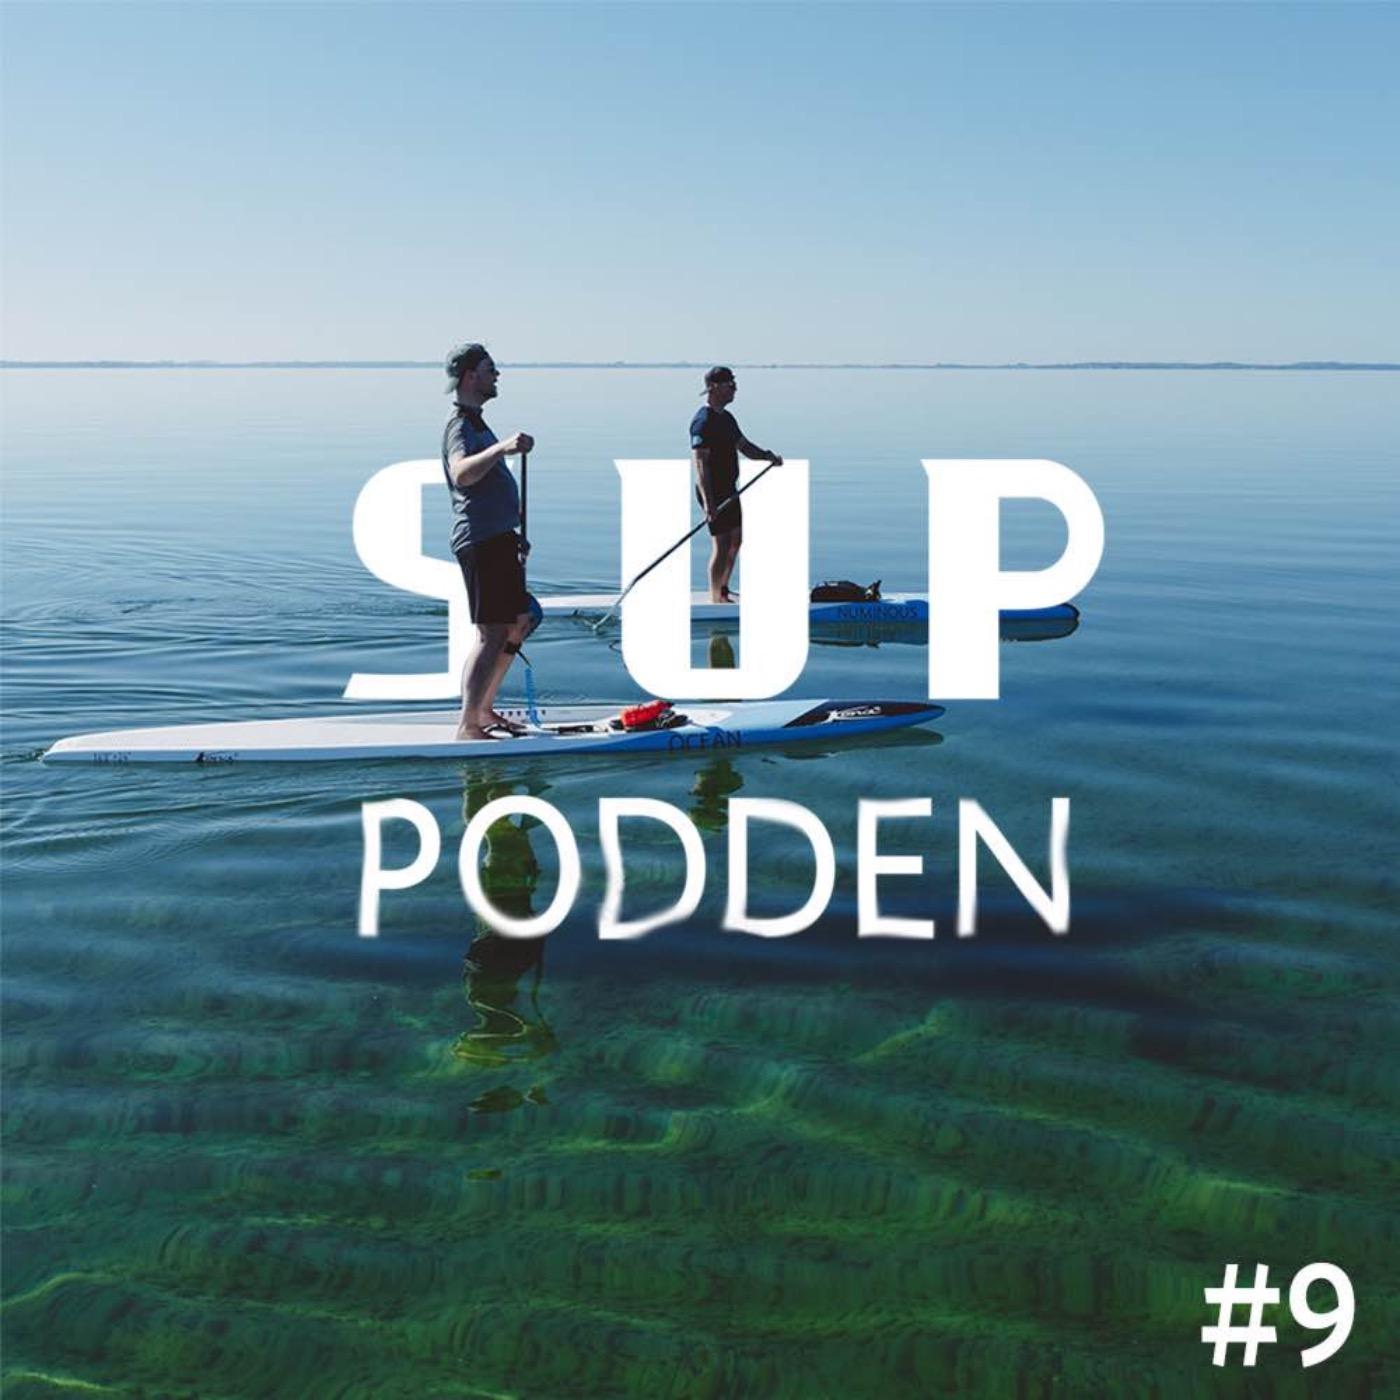 #9 SUP för rehab